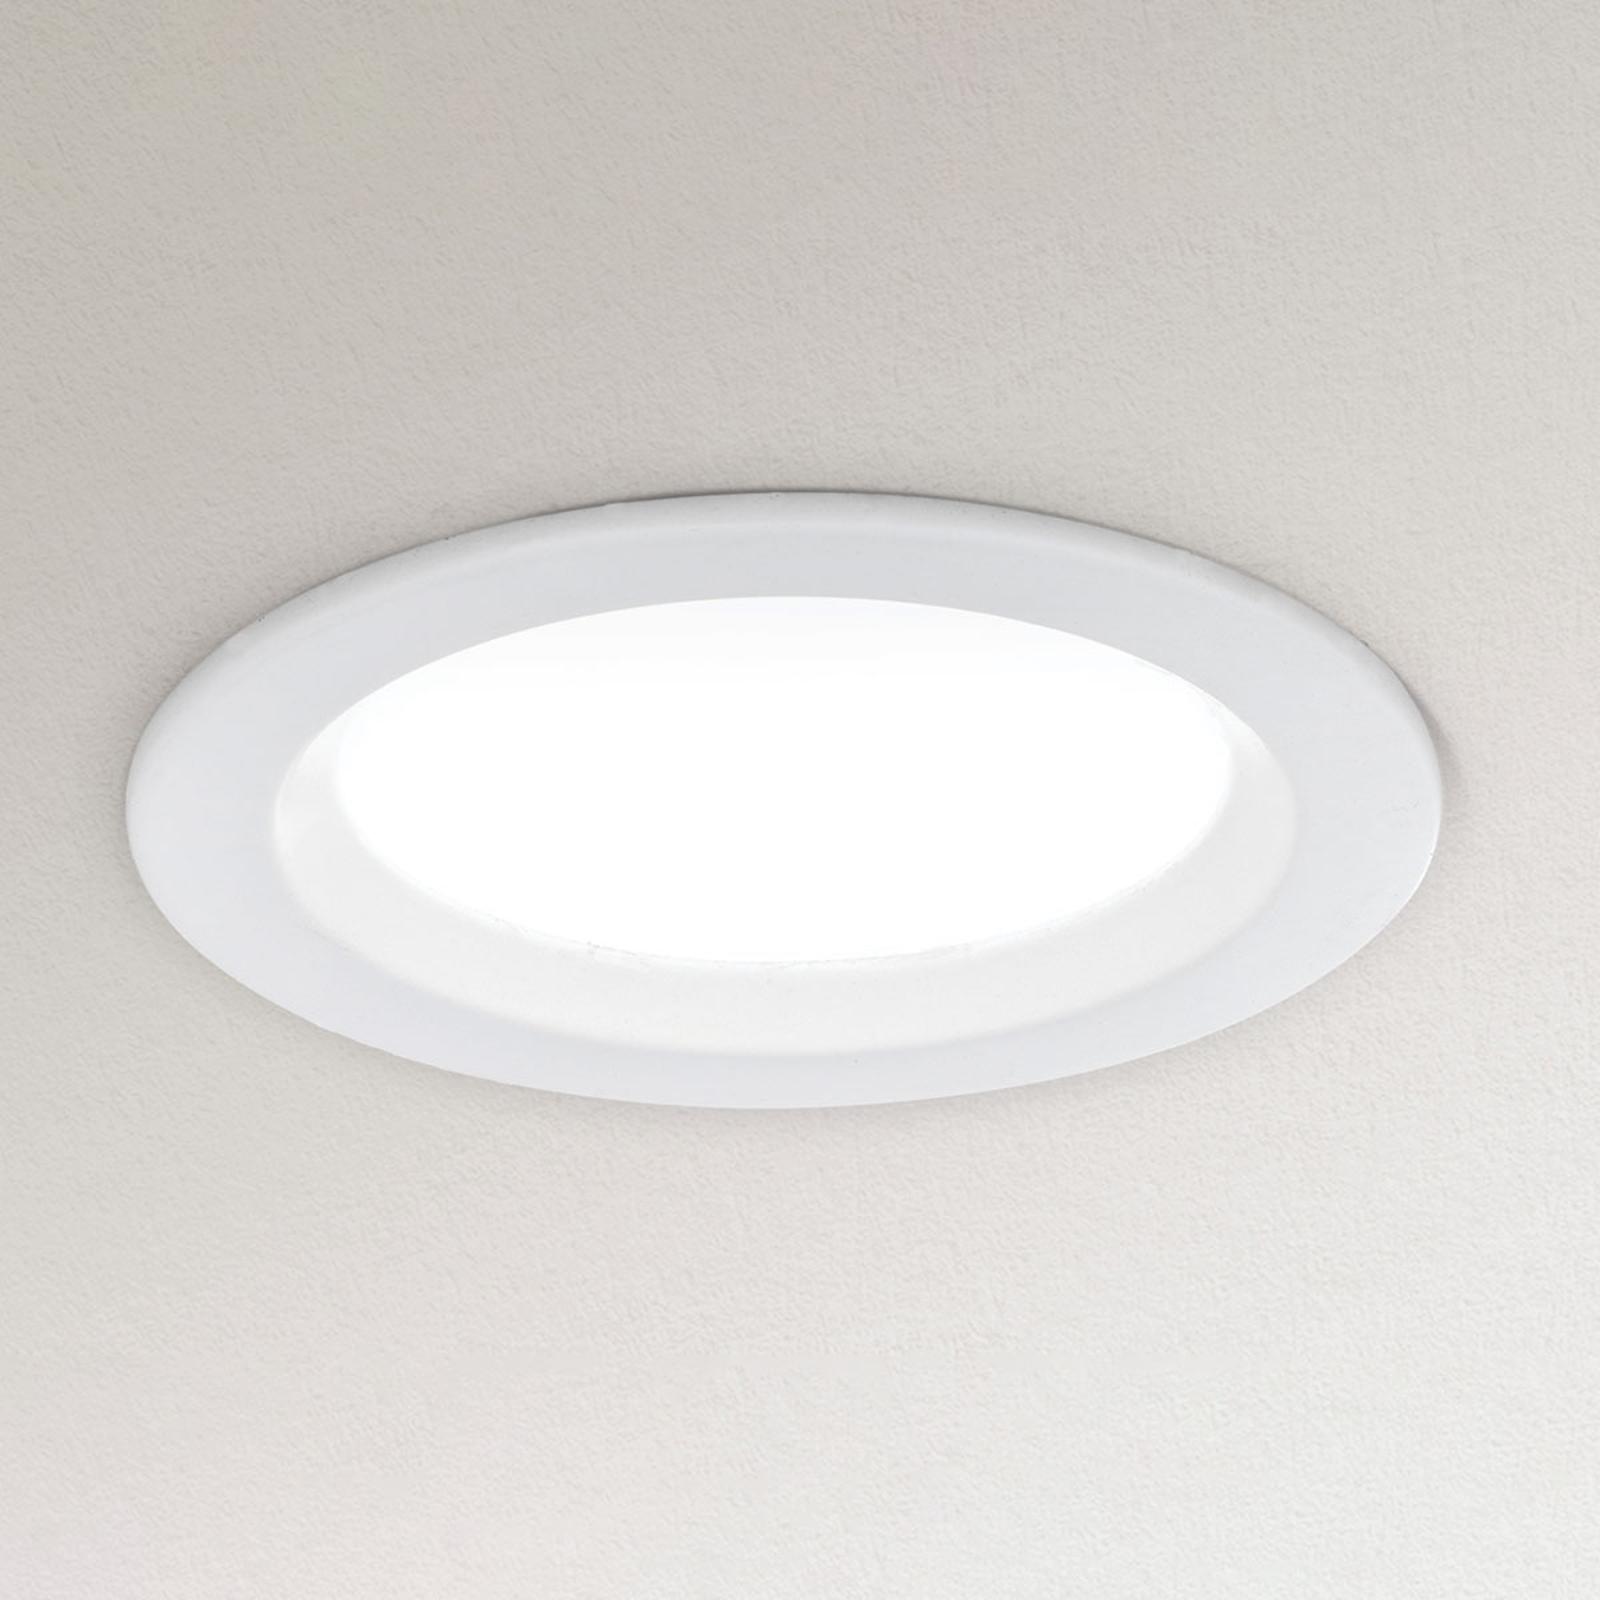 Himmennettävä LED-uppovalaisin Spock, Ø 9 cm